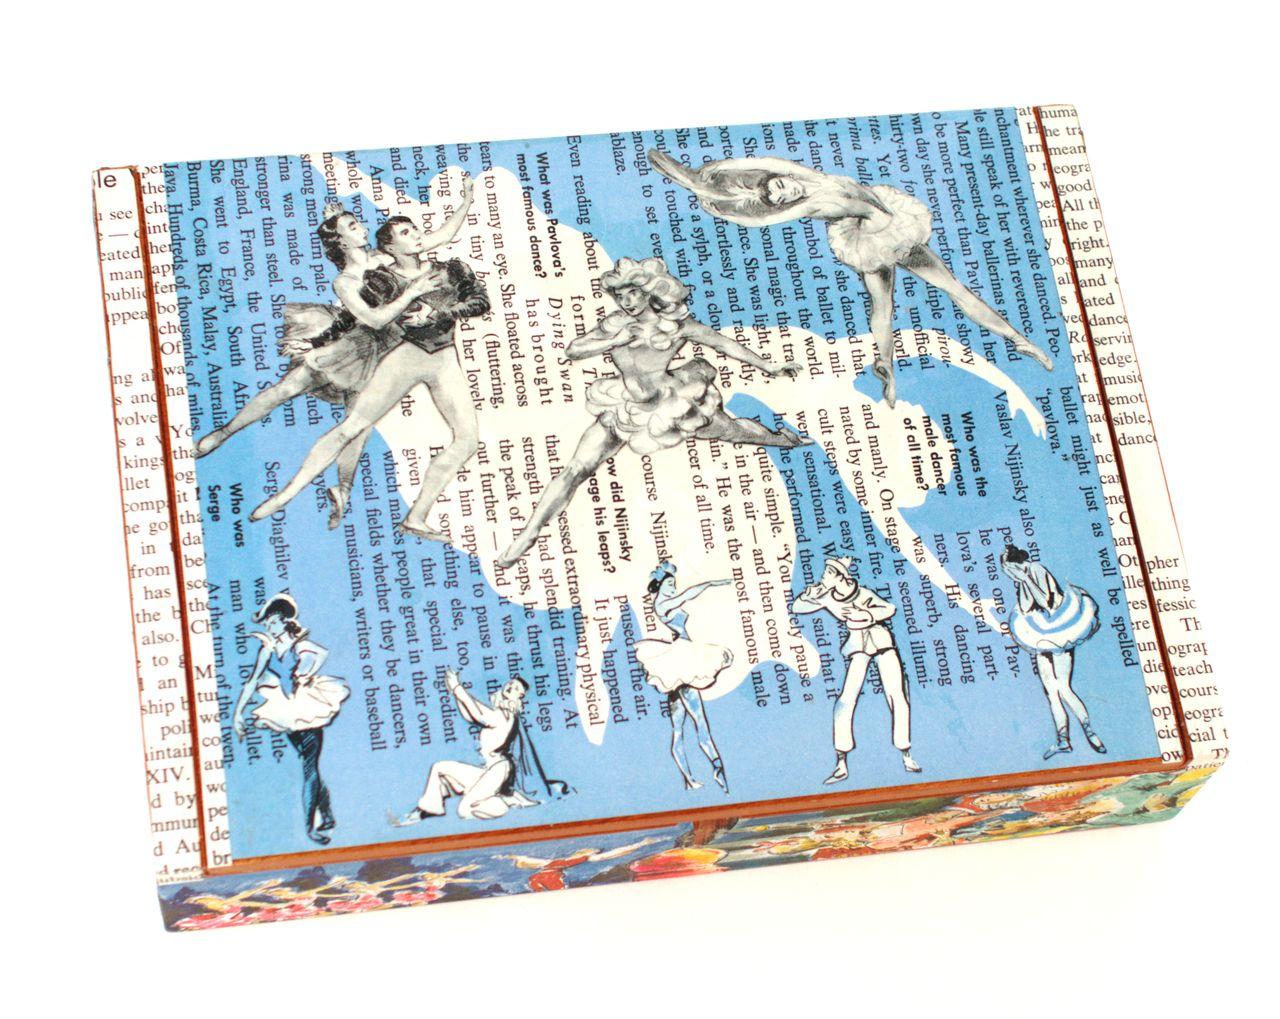 Vintage Sixties Ballerina Swan Lake Children's Book Cigar Box by Paper Vs. Glue